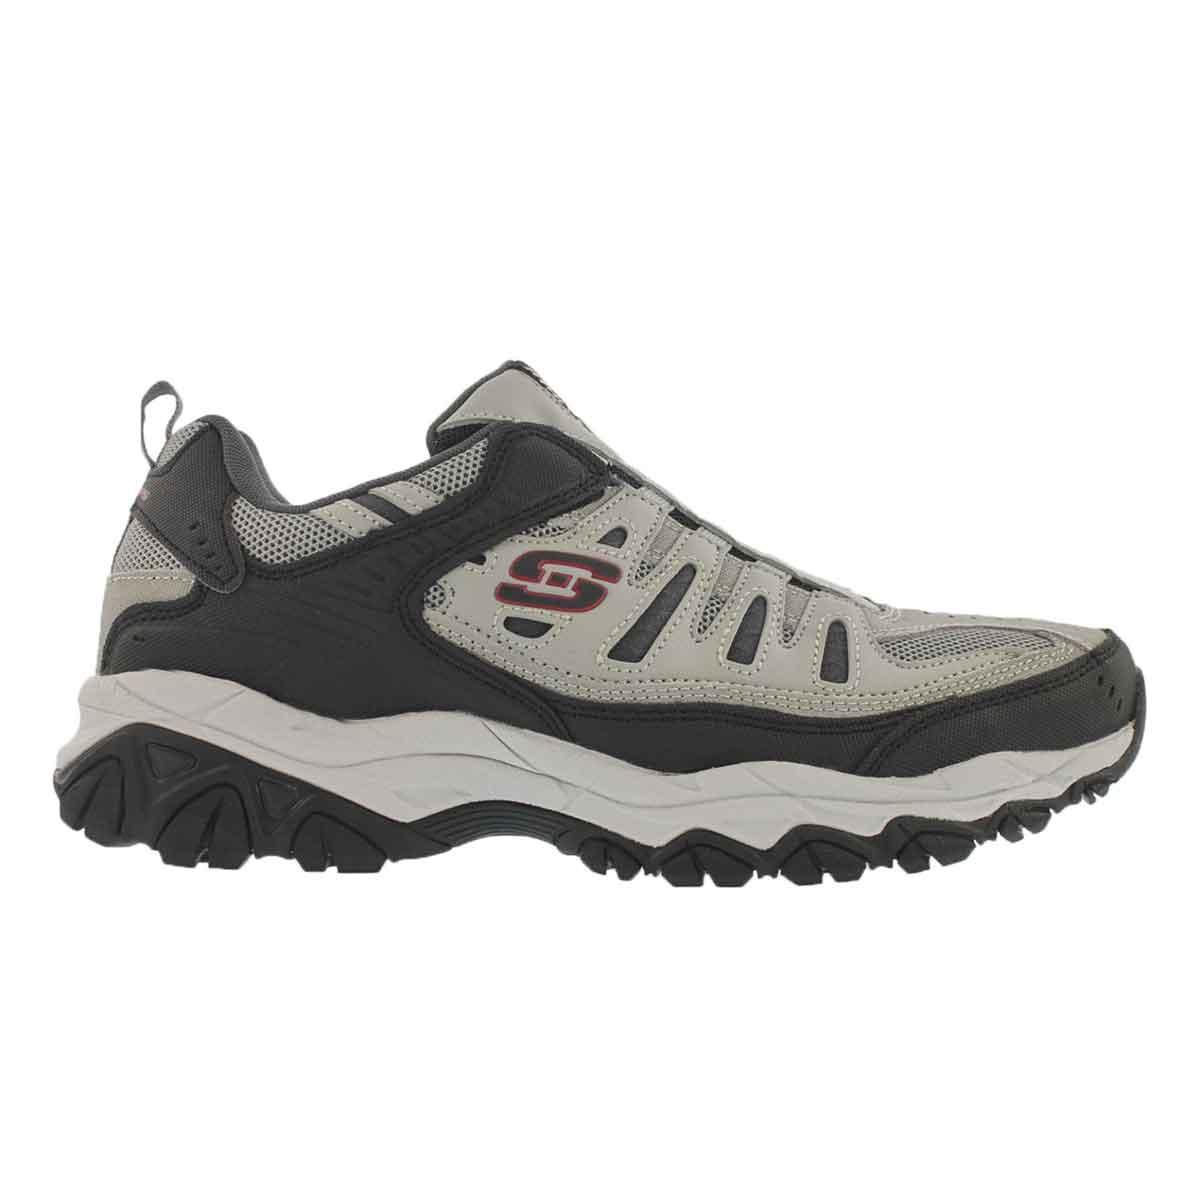 Mns After Burn gy/bk slip on sneaker